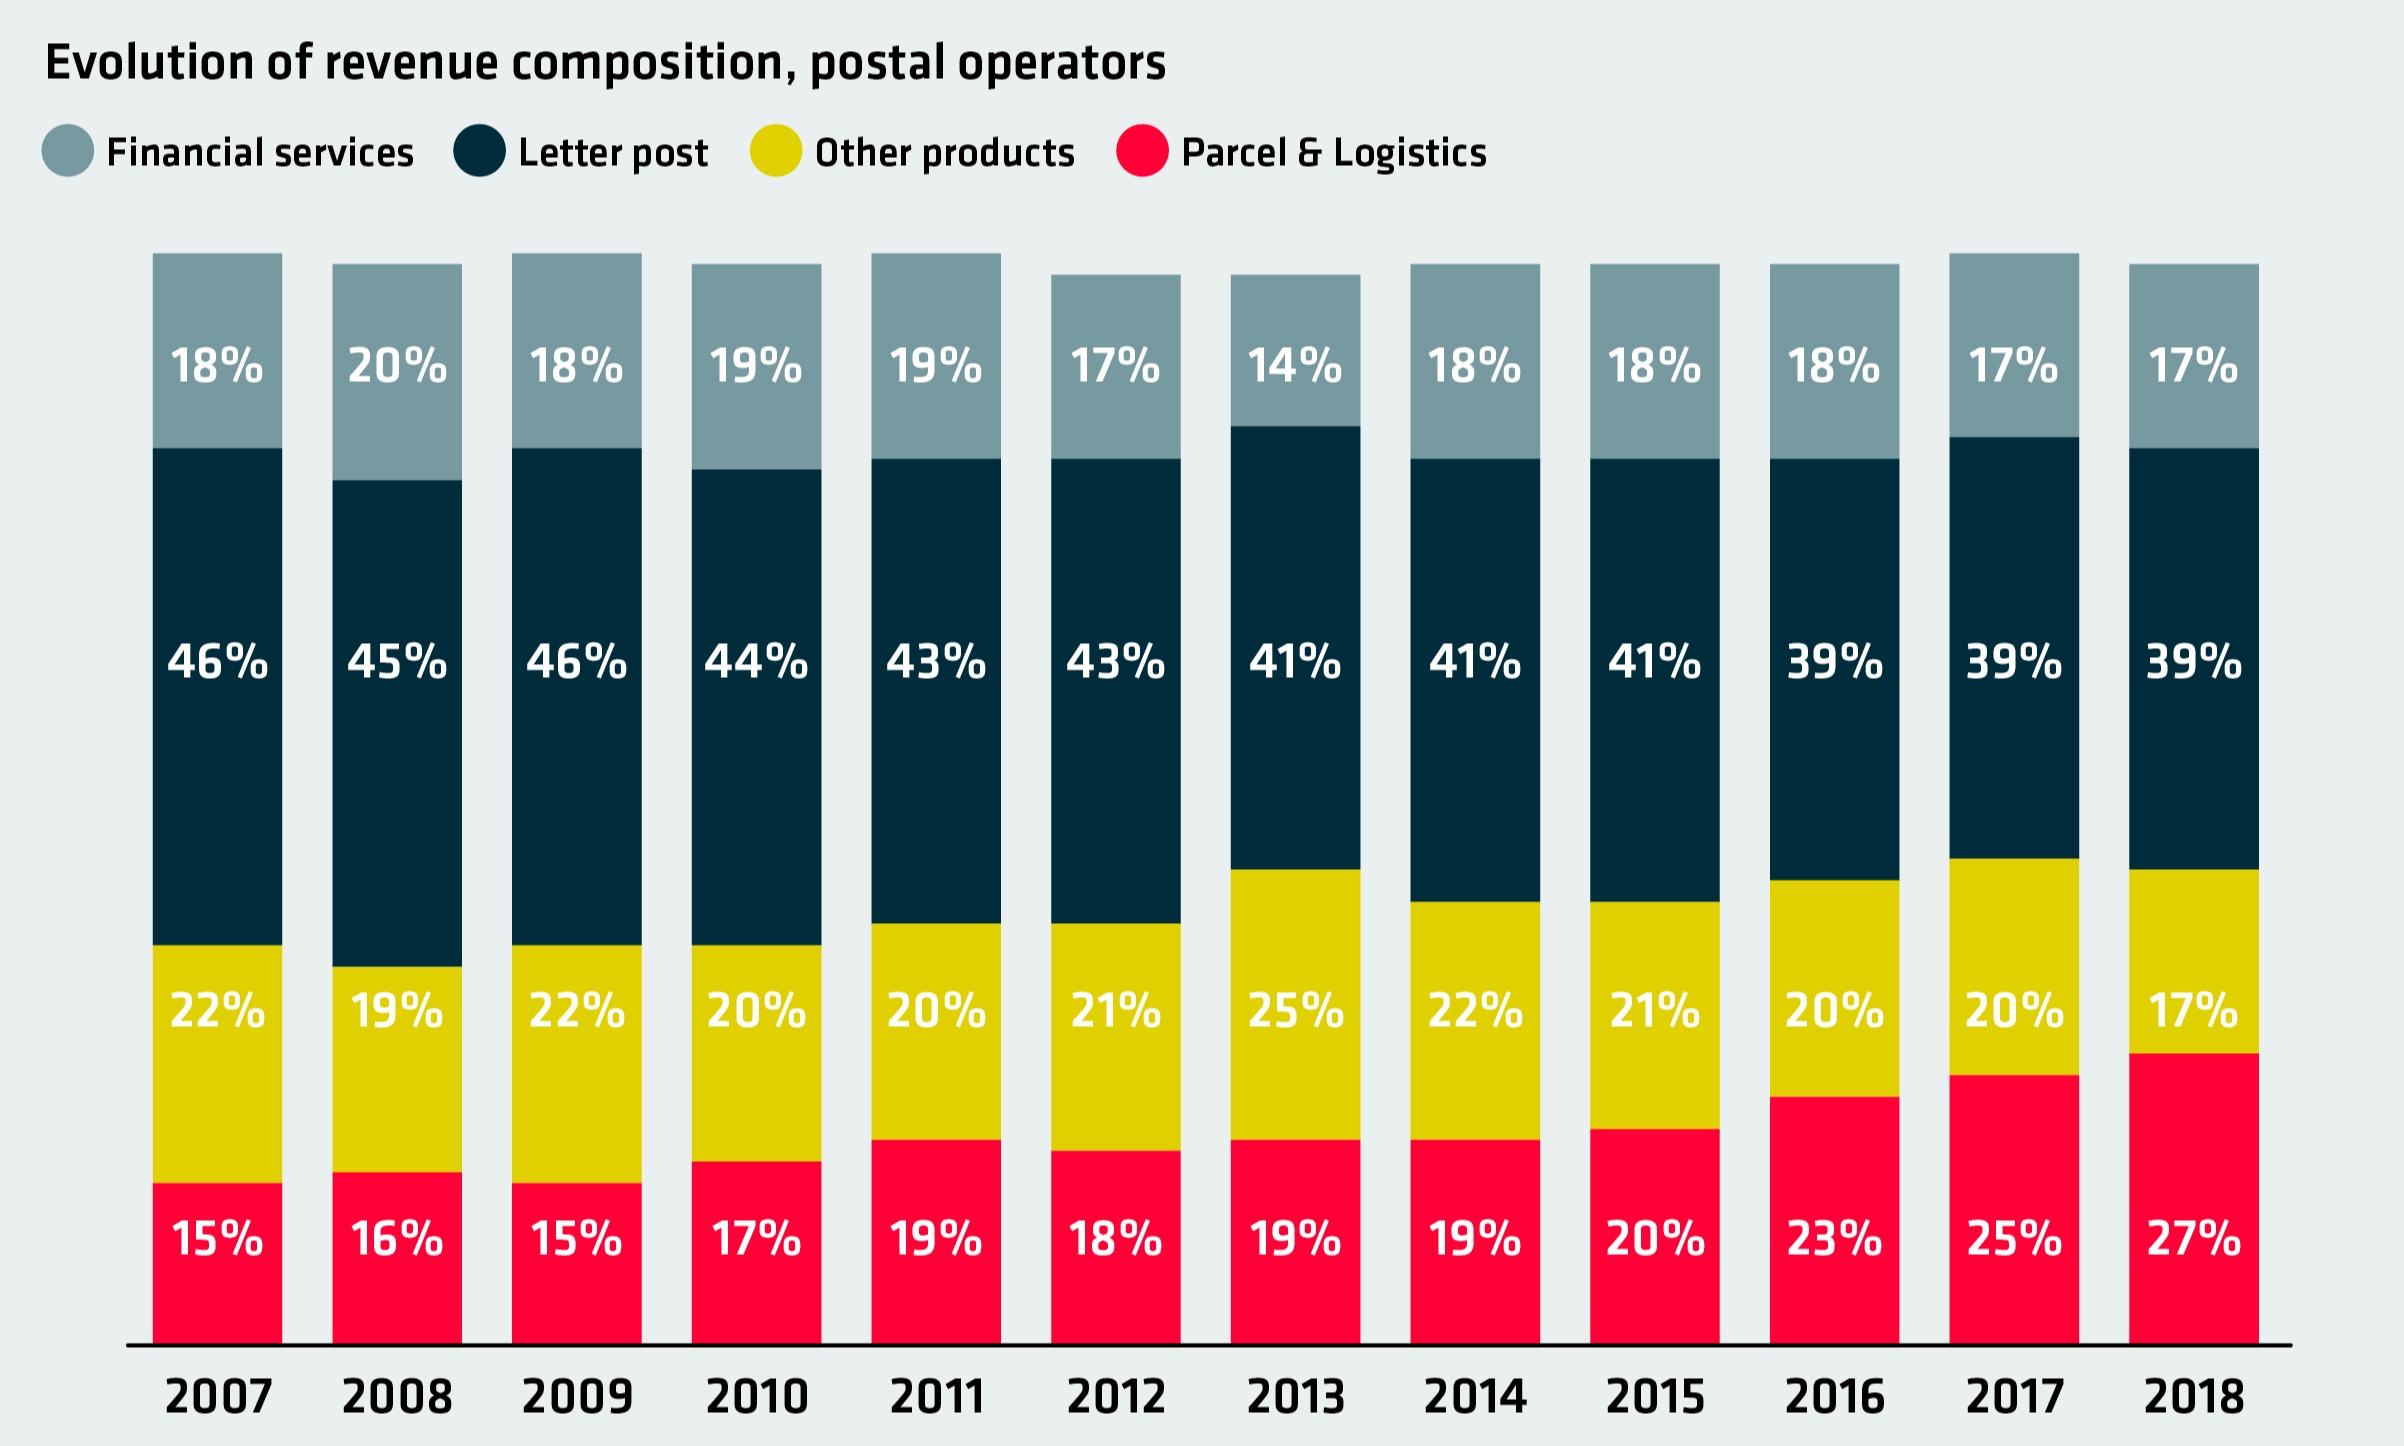 Figure 1: Evolution of revenue composition, postal operators.